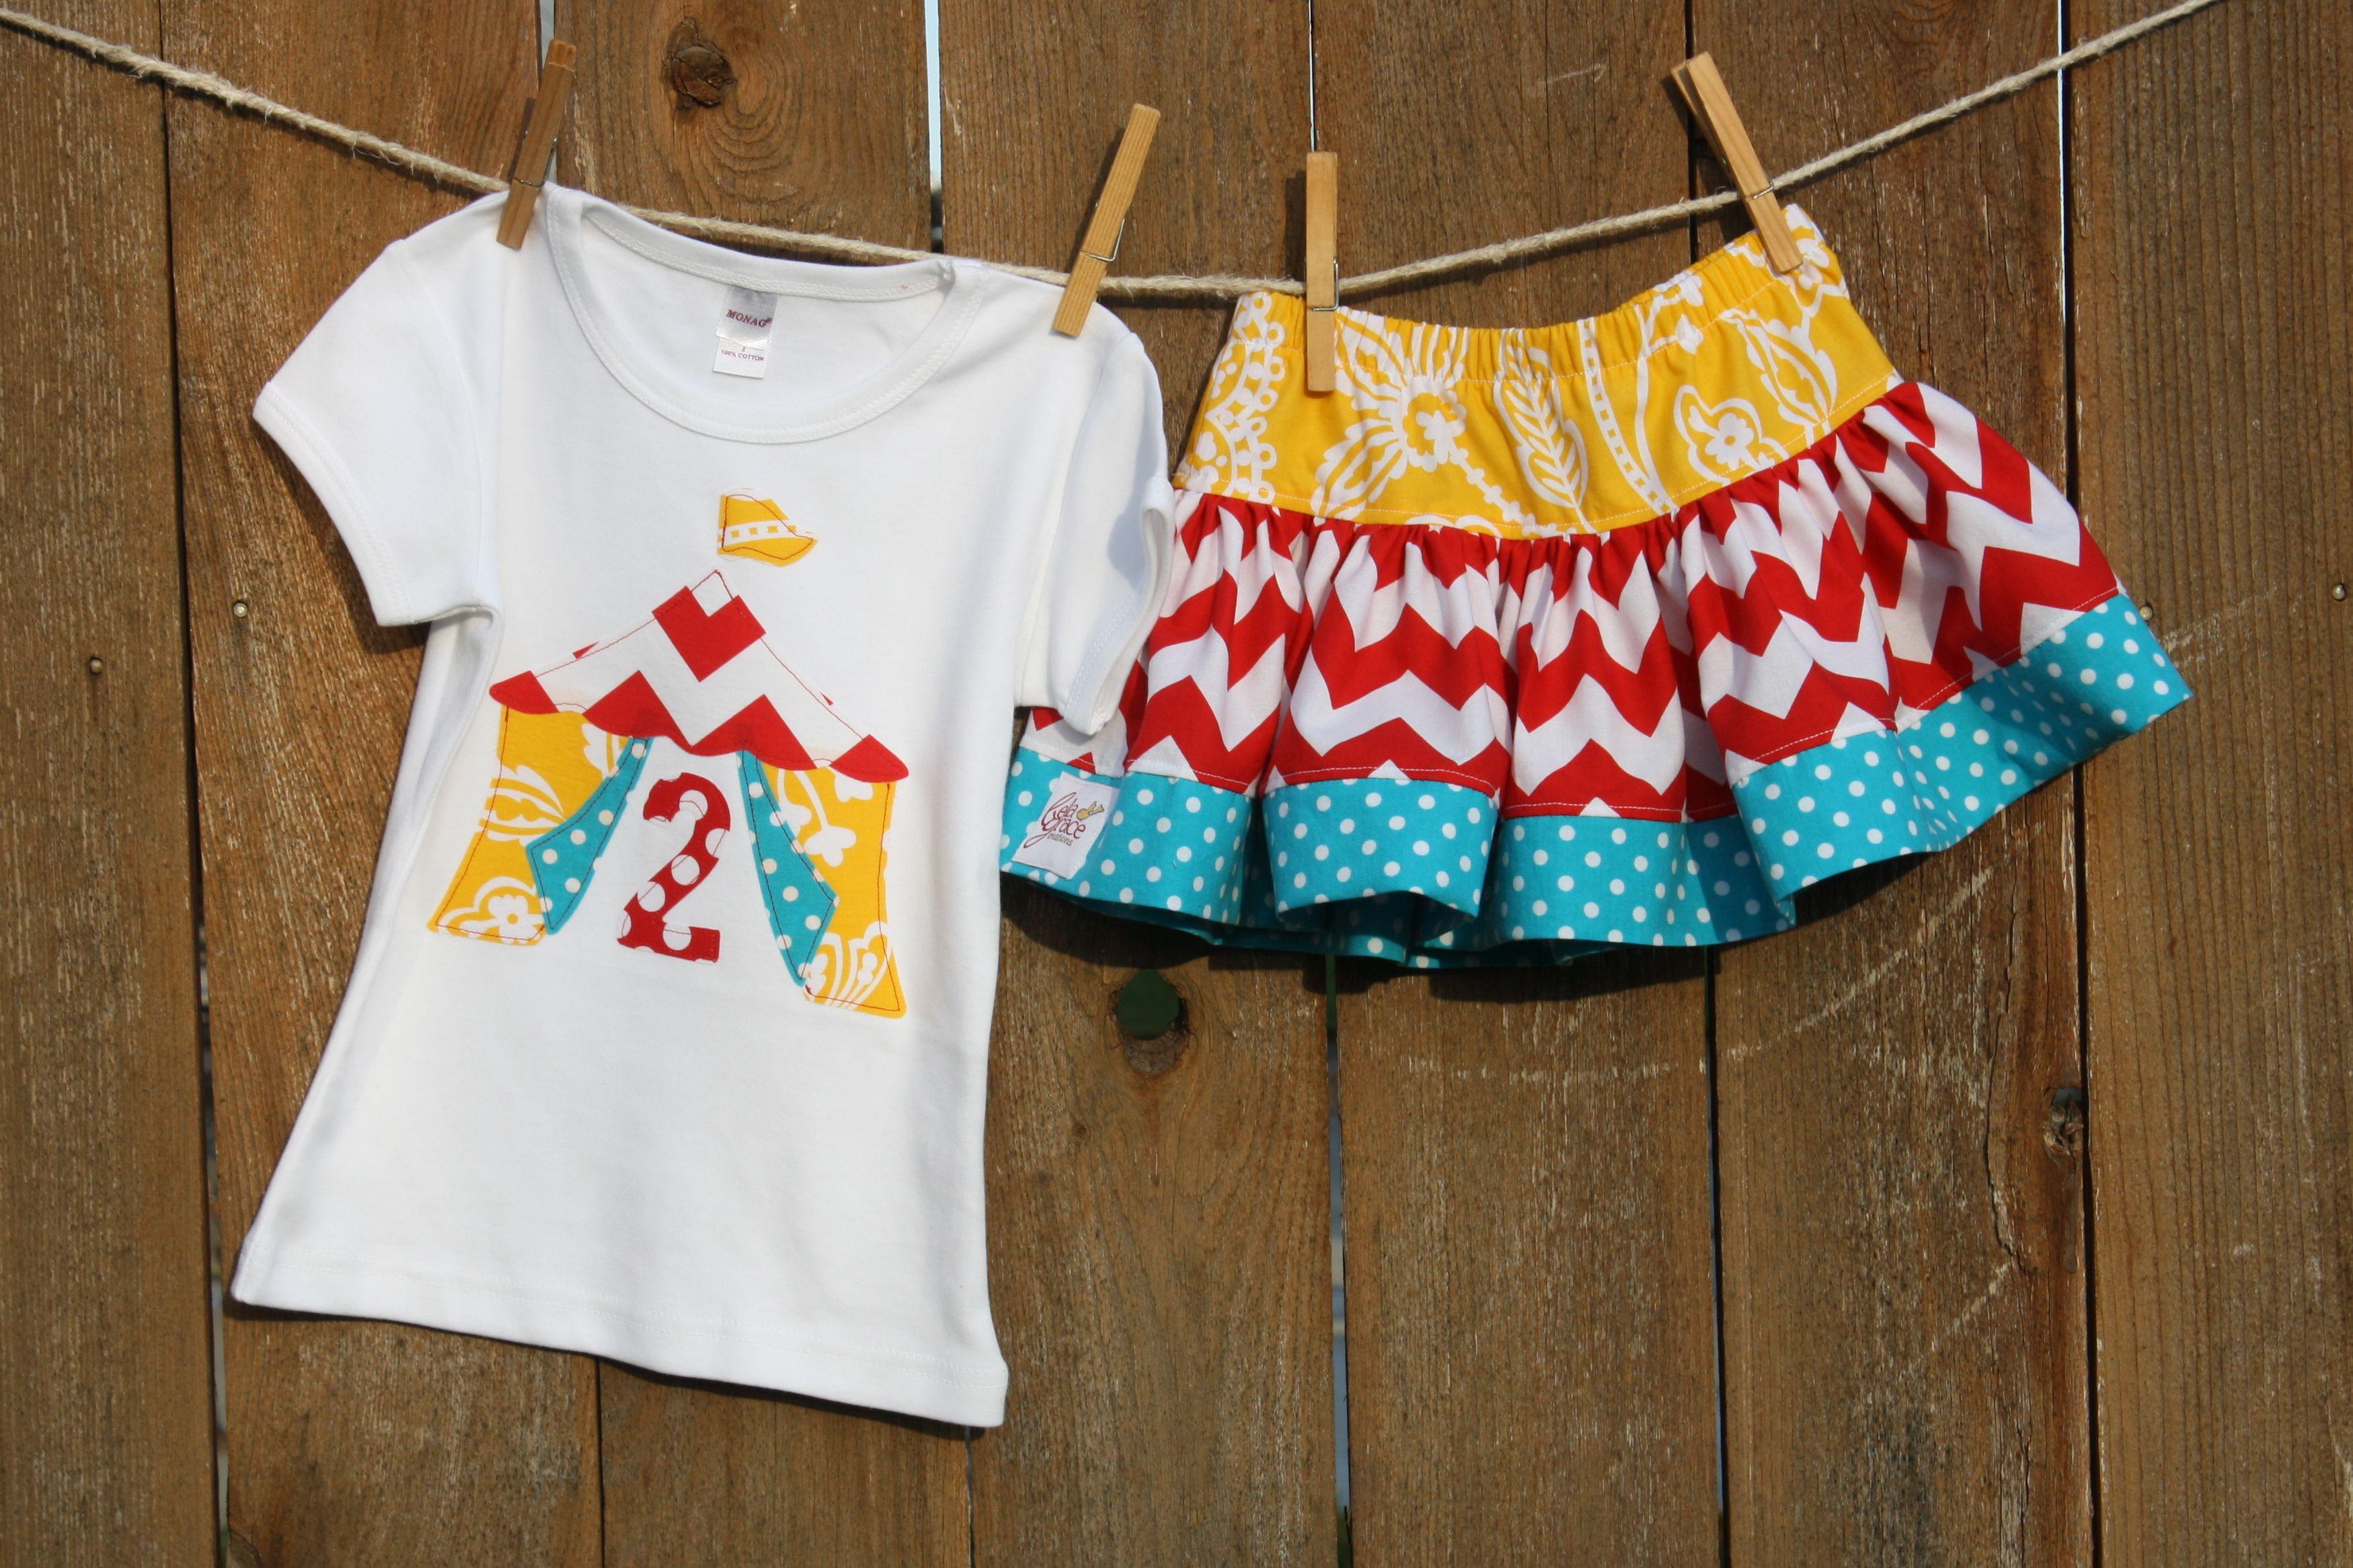 Carousel Horse or Big Top Tent Shirt and Skirt Set - Thumbnail 1 cc9cee7ed